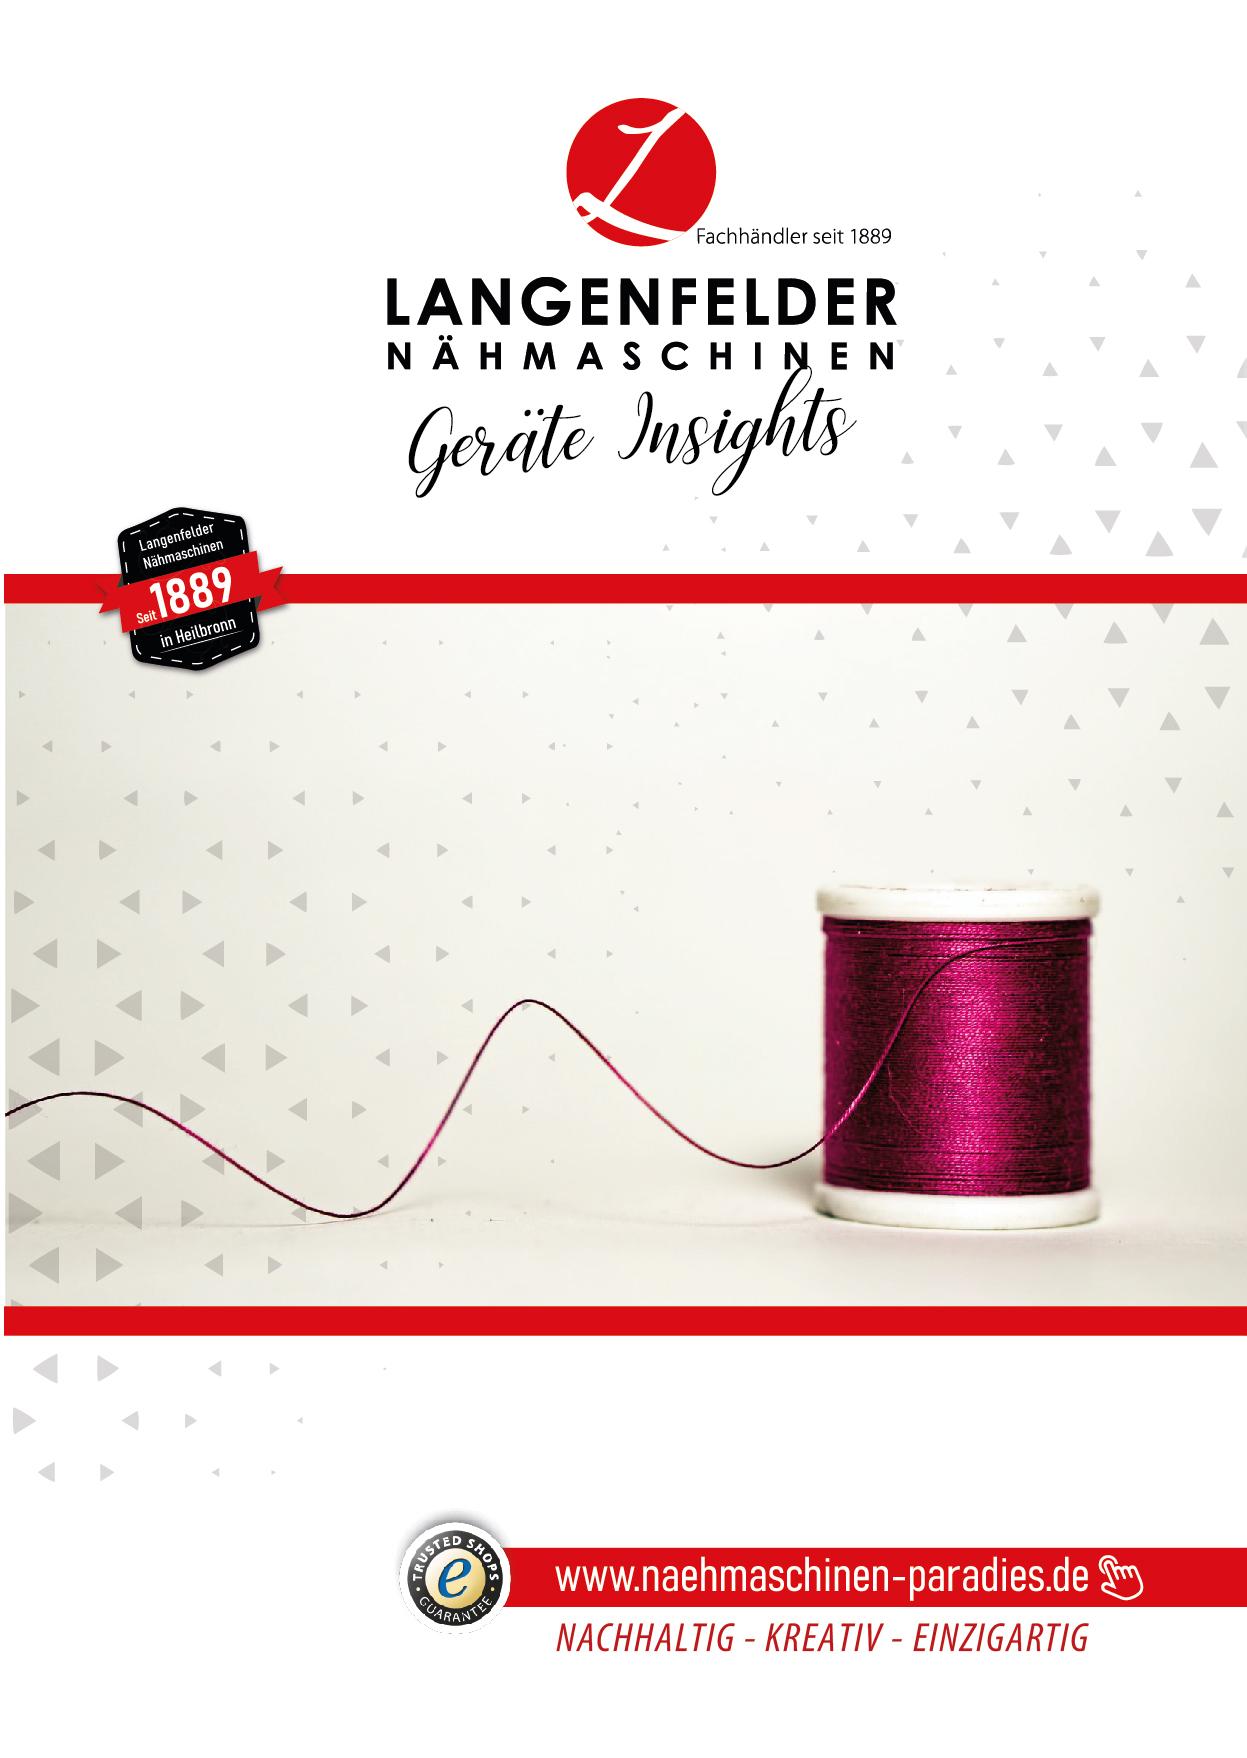 Langenfelder Nähmaschinen Geräte Insights